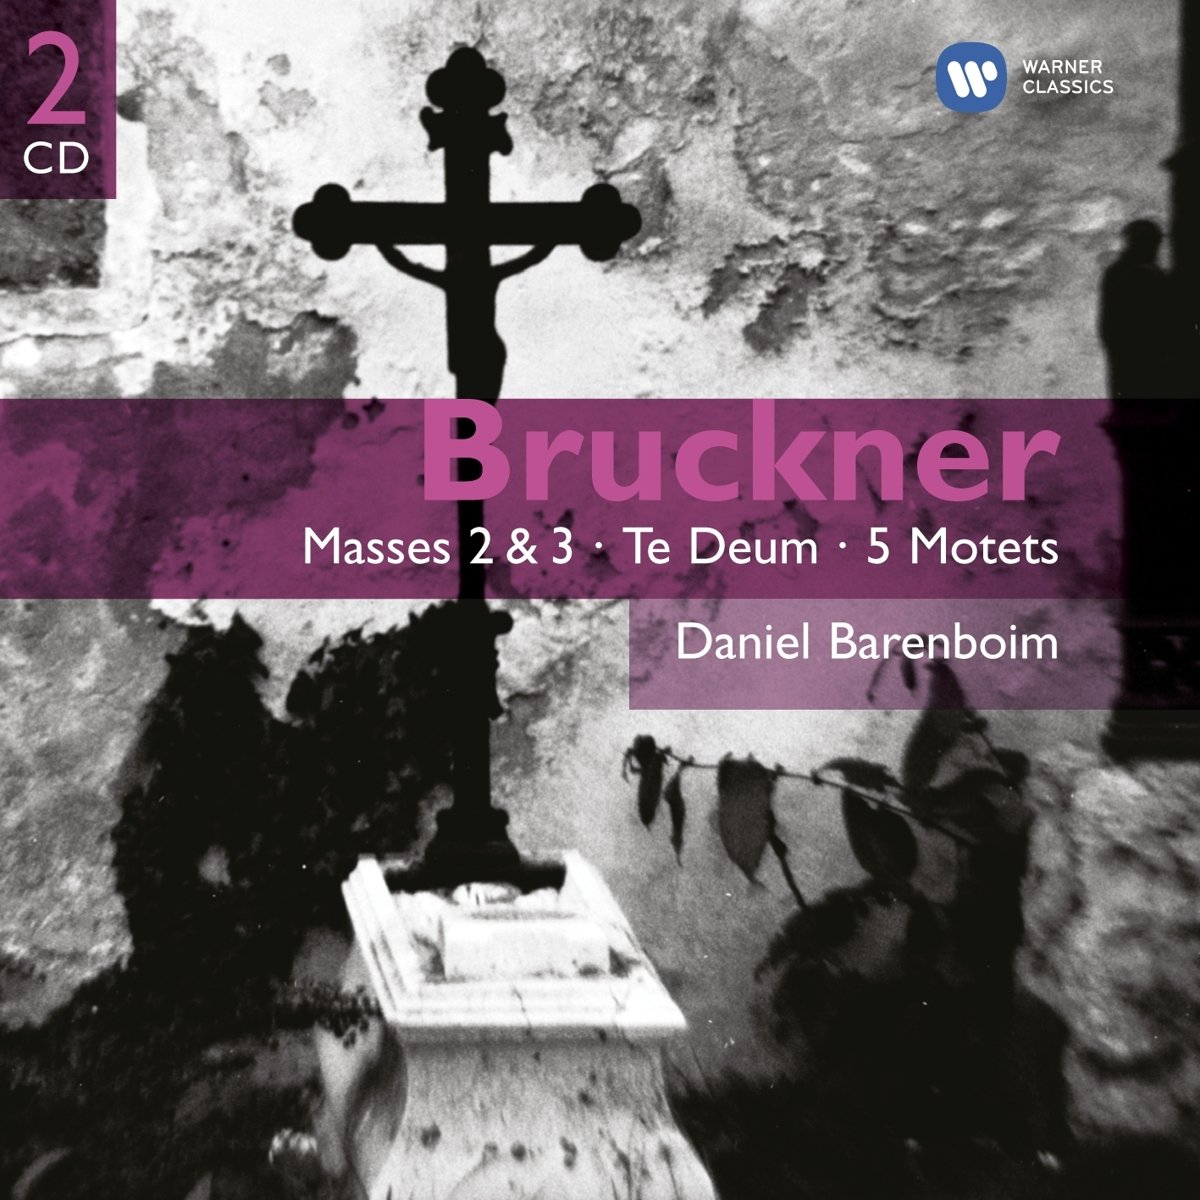 Bruckner: Masses #2 Sale item 3 5 Motets Choice Deum Te